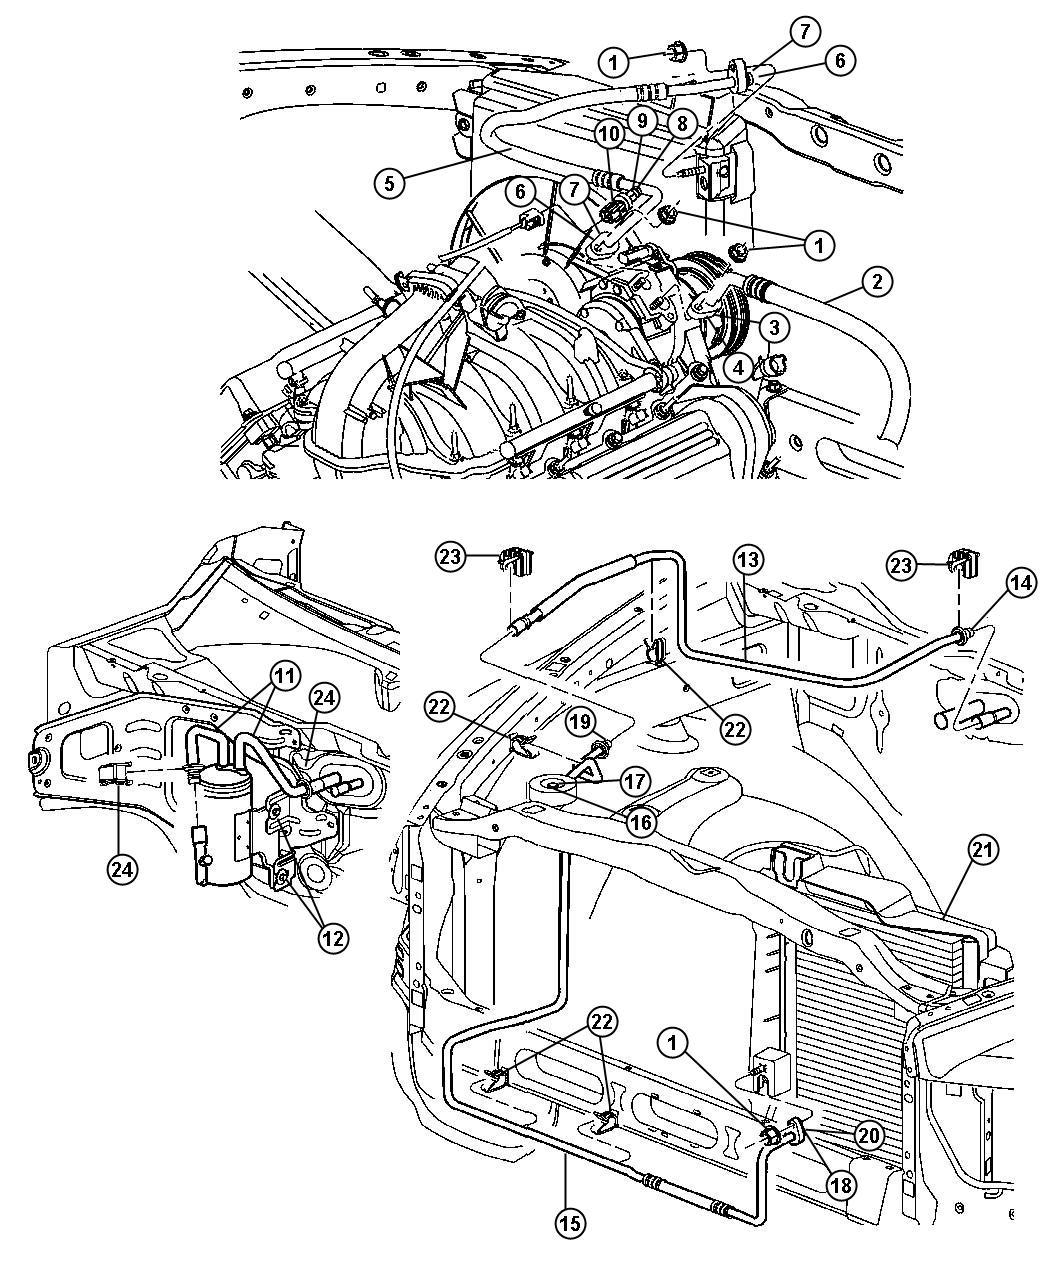 Dodge Dakota Clip. Wiring. Liquid line attaching, with air